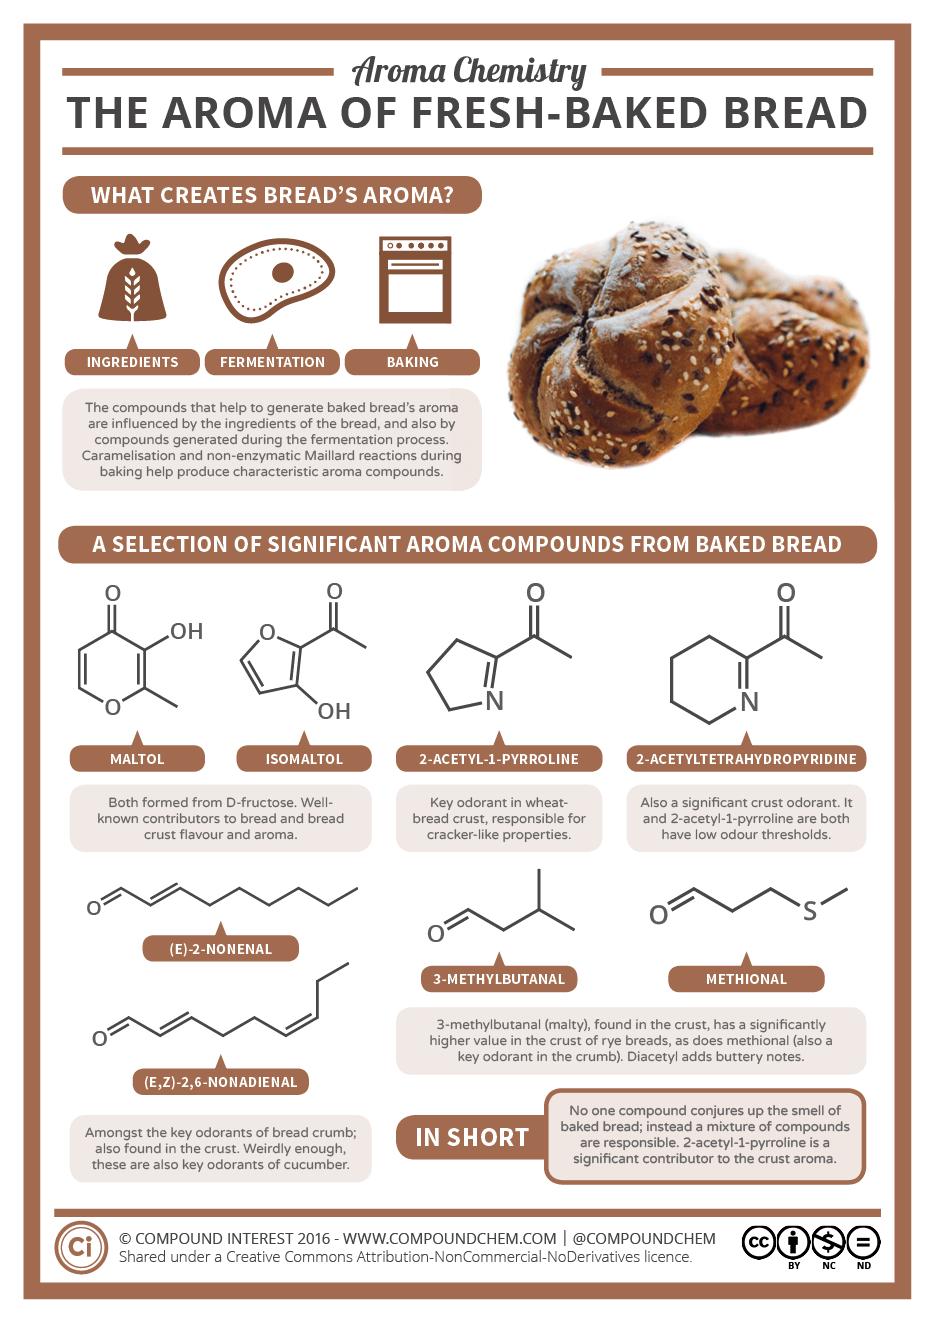 Aroma Chemistry – Fresh-Baked Bread